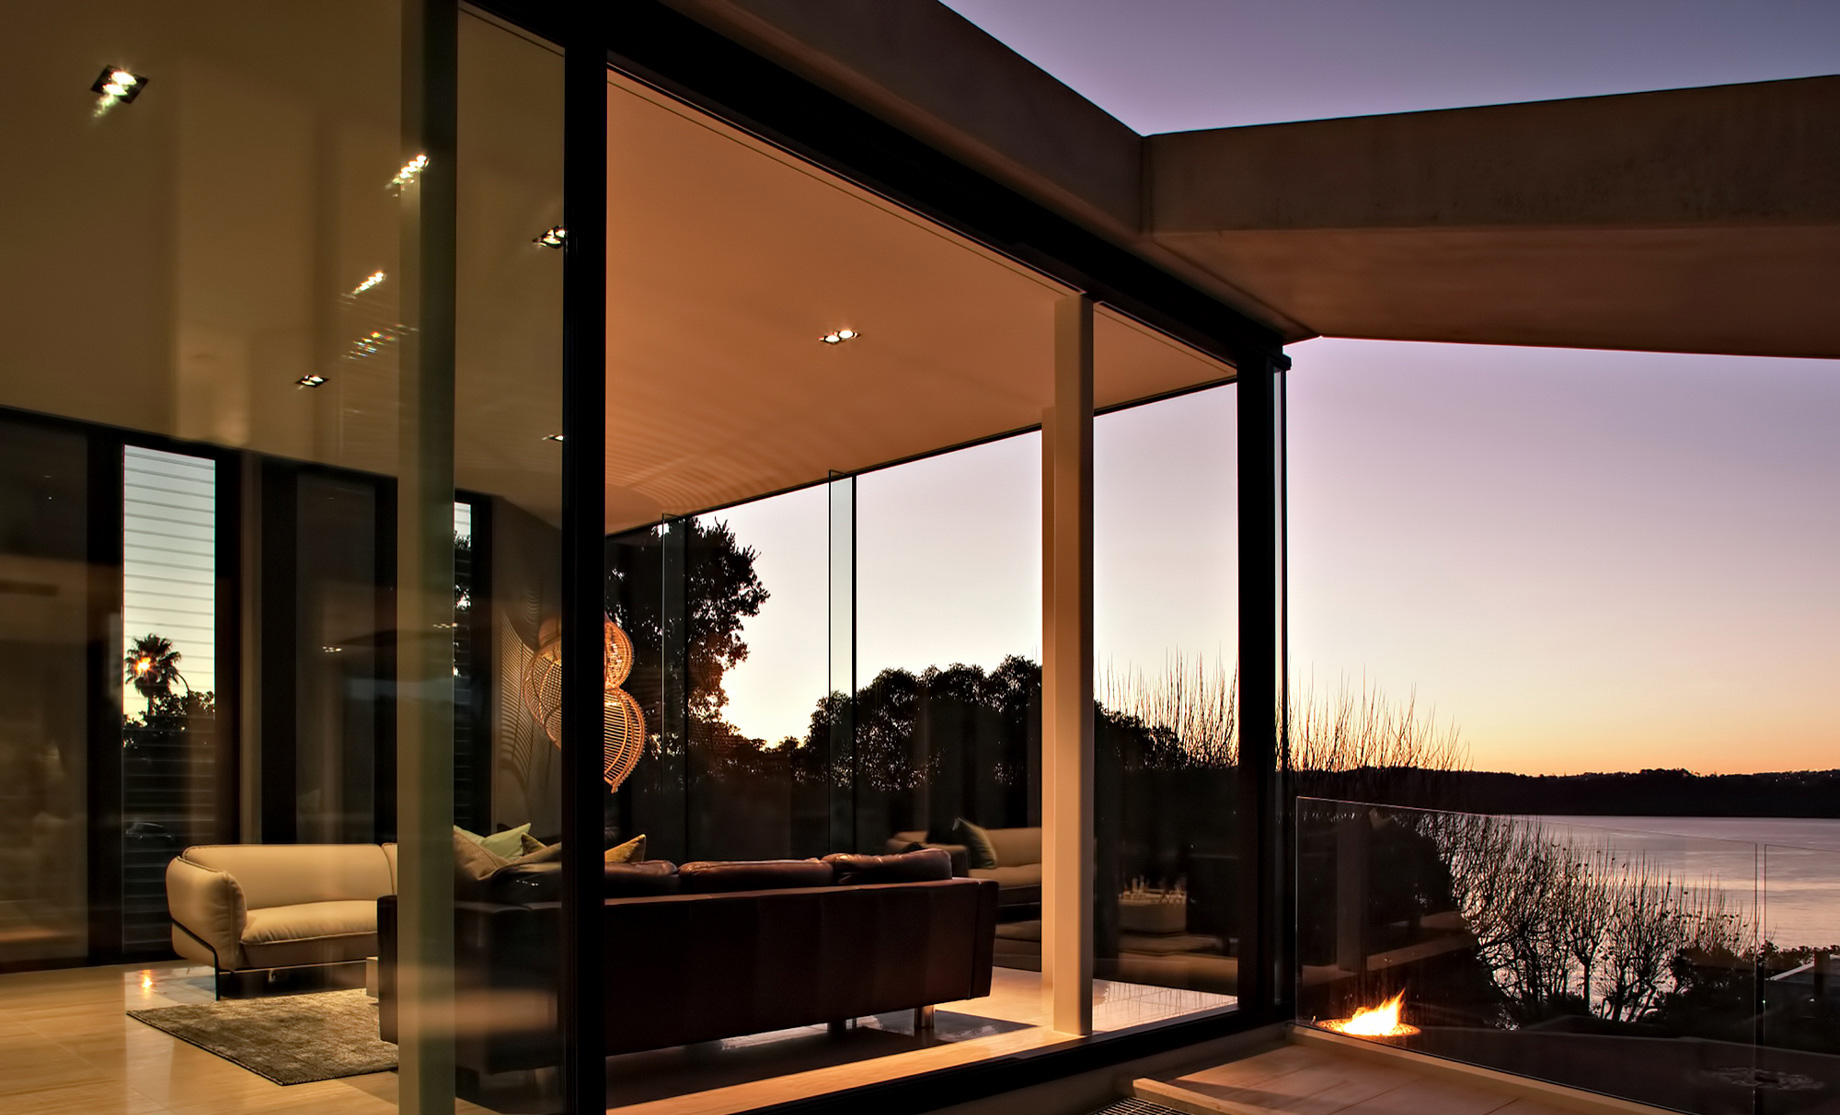 Herne Bay Road House – Herne Bay, Auckland, New Zealand